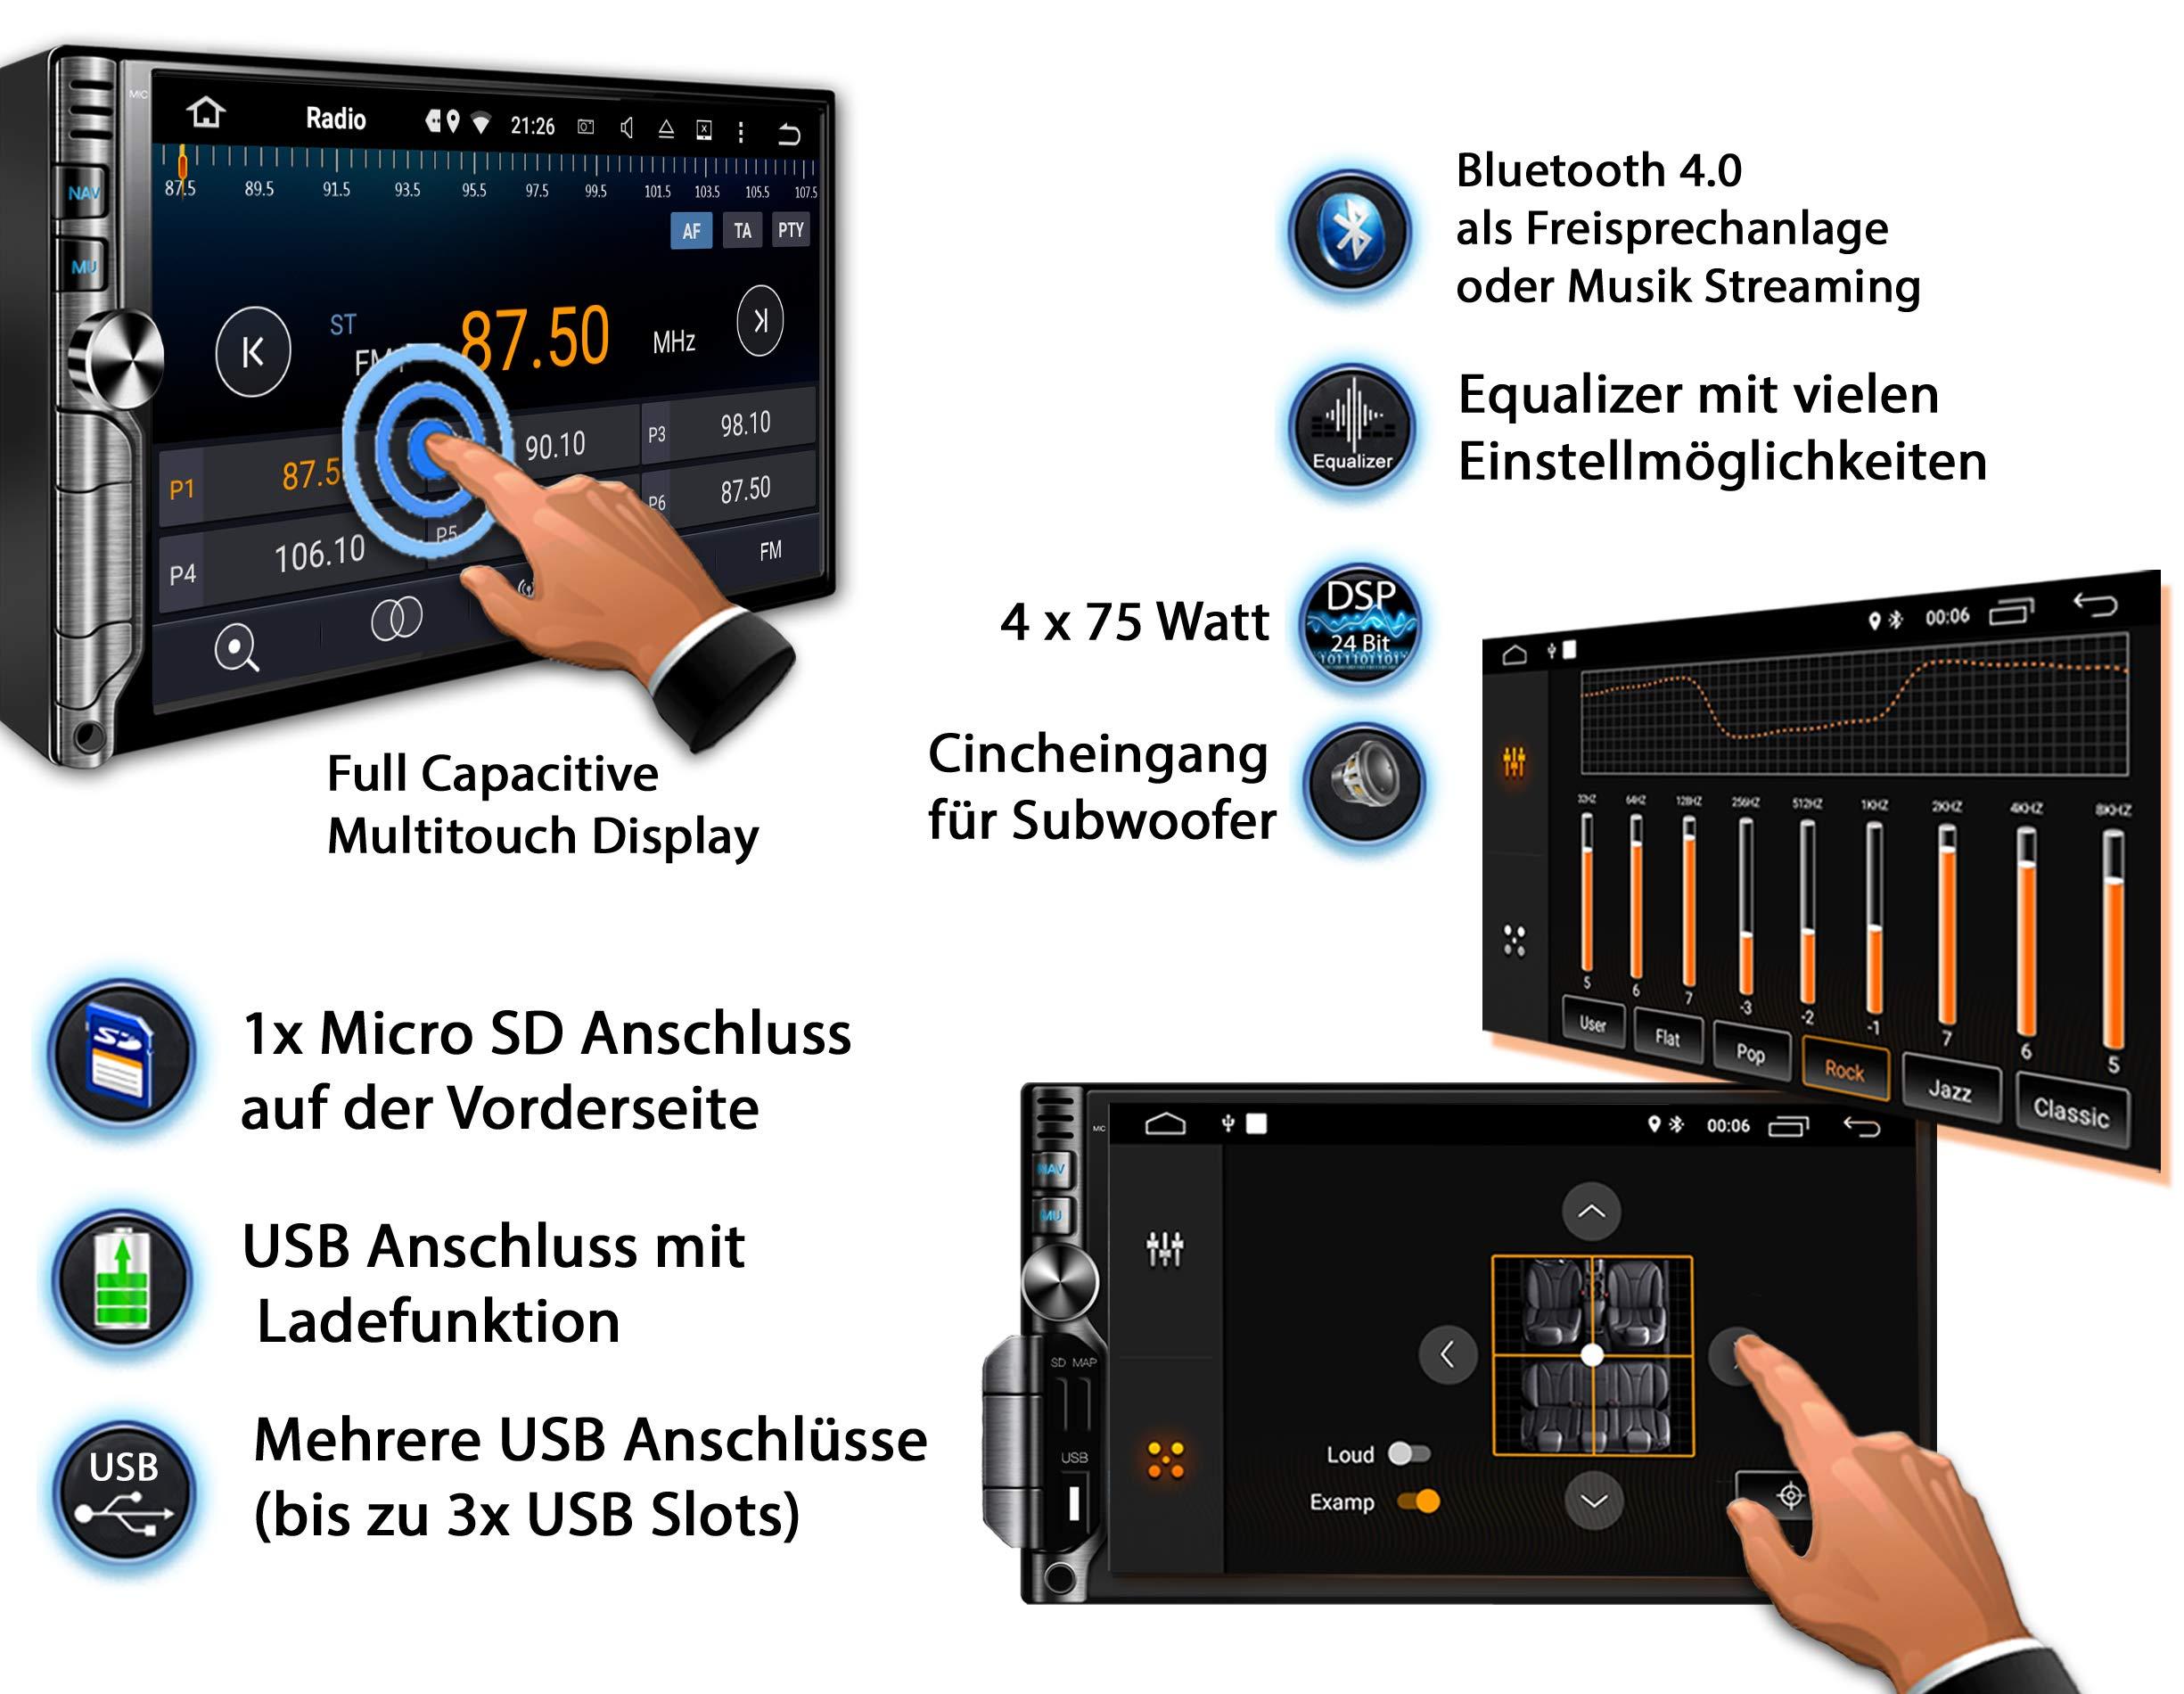 Tristan-Auron-BT2D7019A-Autoradio-Android-81-7-Zoll-Touchscreen-Bildschirm-GPS-Navi-Bluetooth-Freisprecheinrichtung-Quad-Core-MirrorLink-USBSD-OBD-2-DAB-Doppel-Din